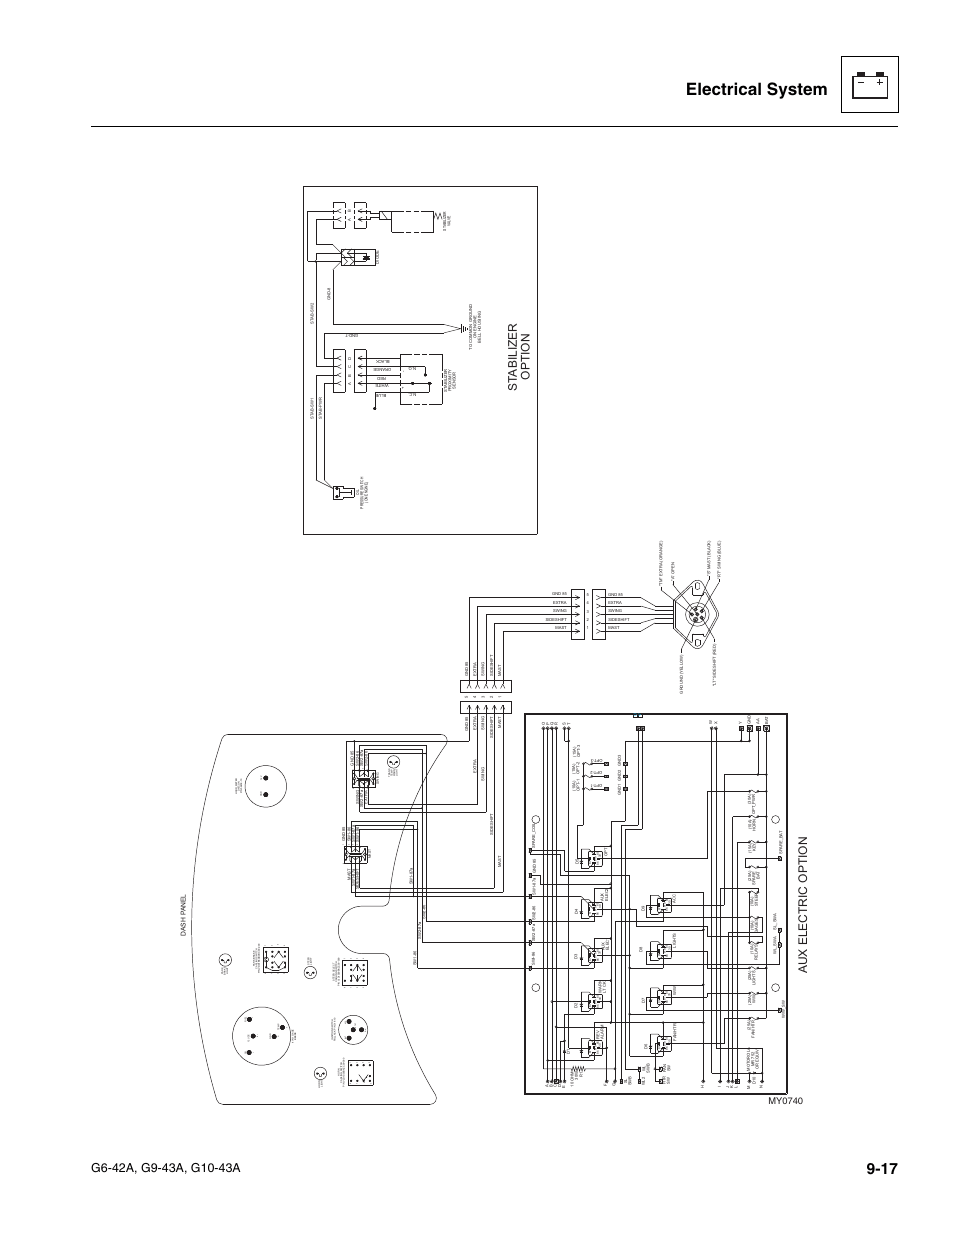 Electrical system, St abilizer option, Aux electric option